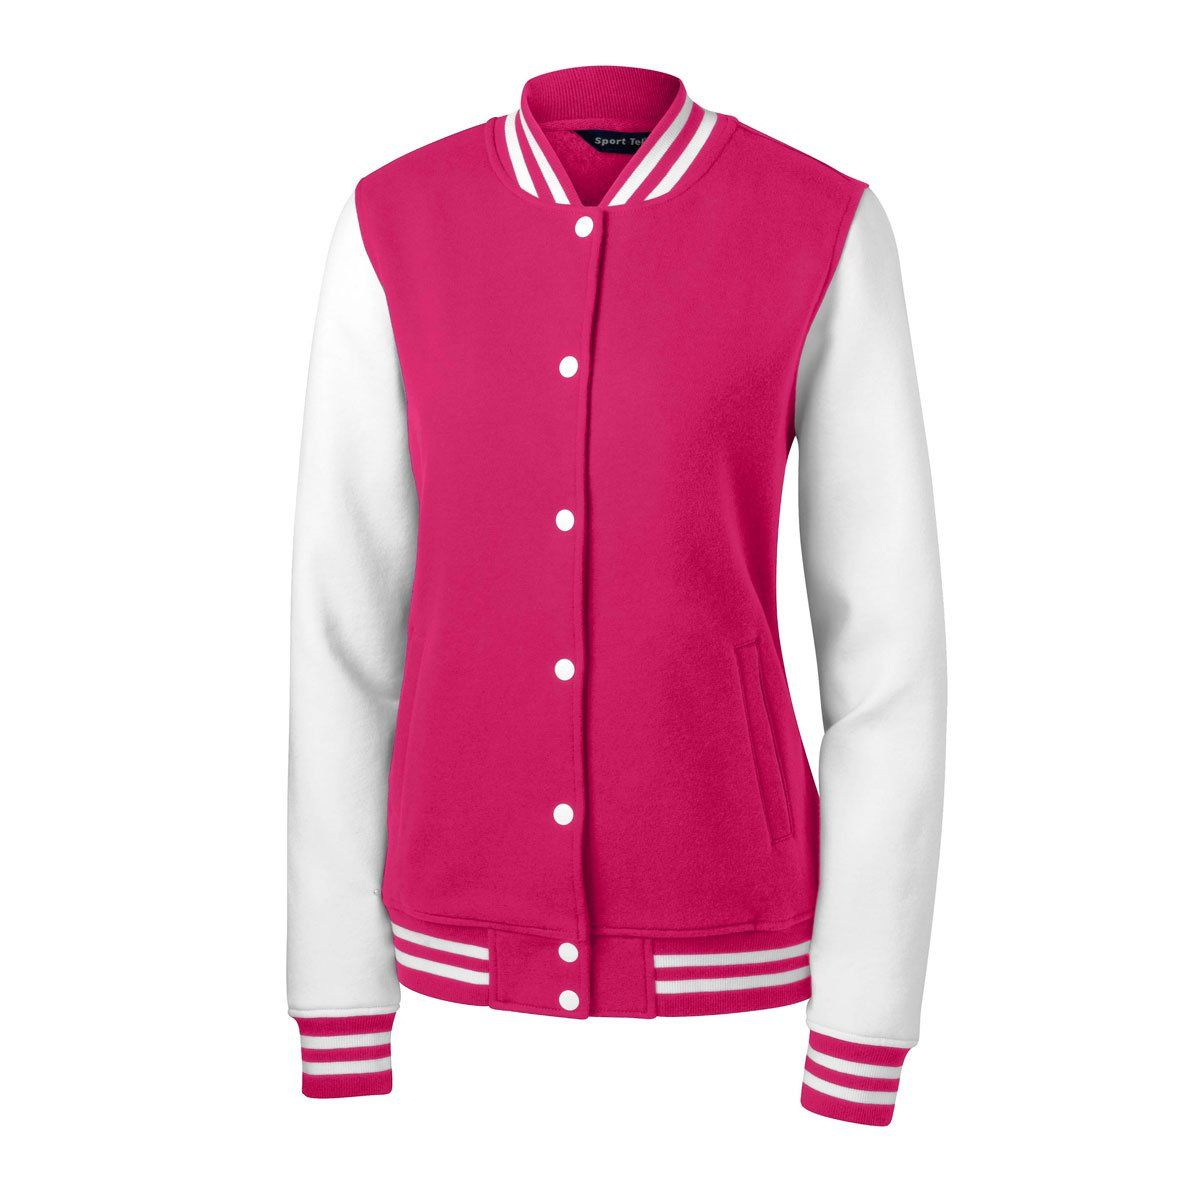 Sport-Tek Women's Pink Raspberry/White Fleece Letterman